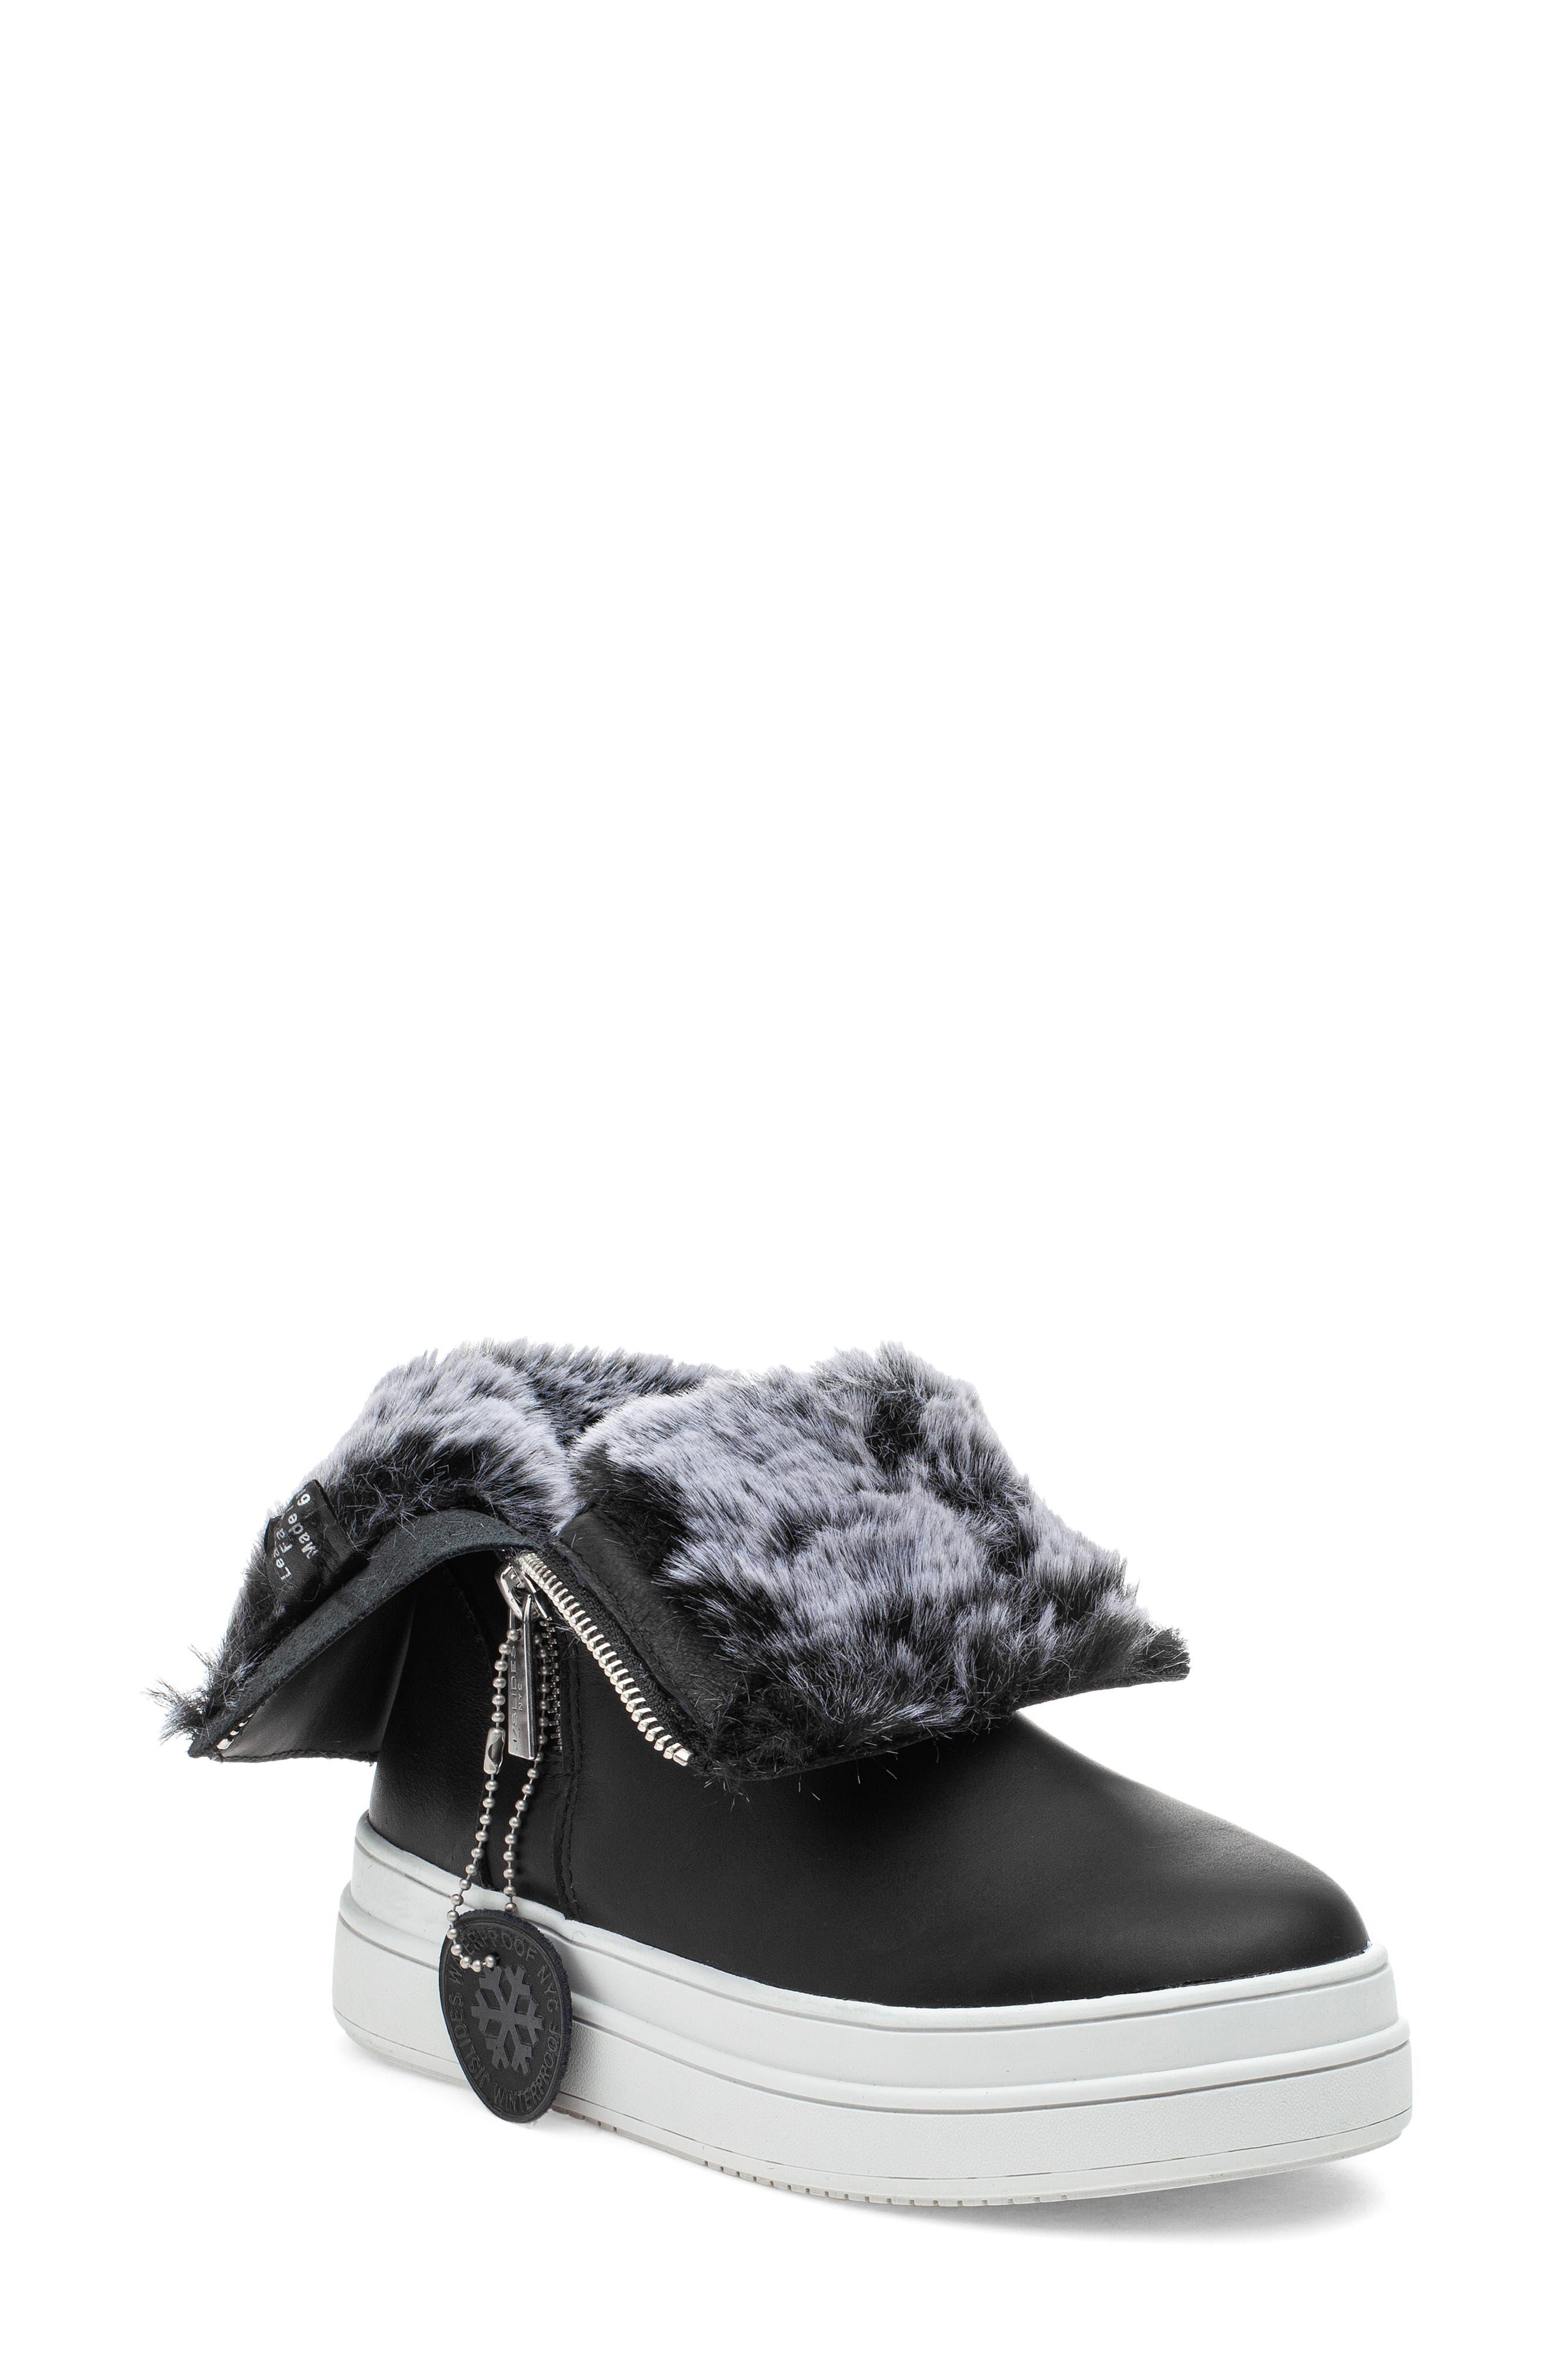 Tristan Faux Fur Platform Sneaker Bootie